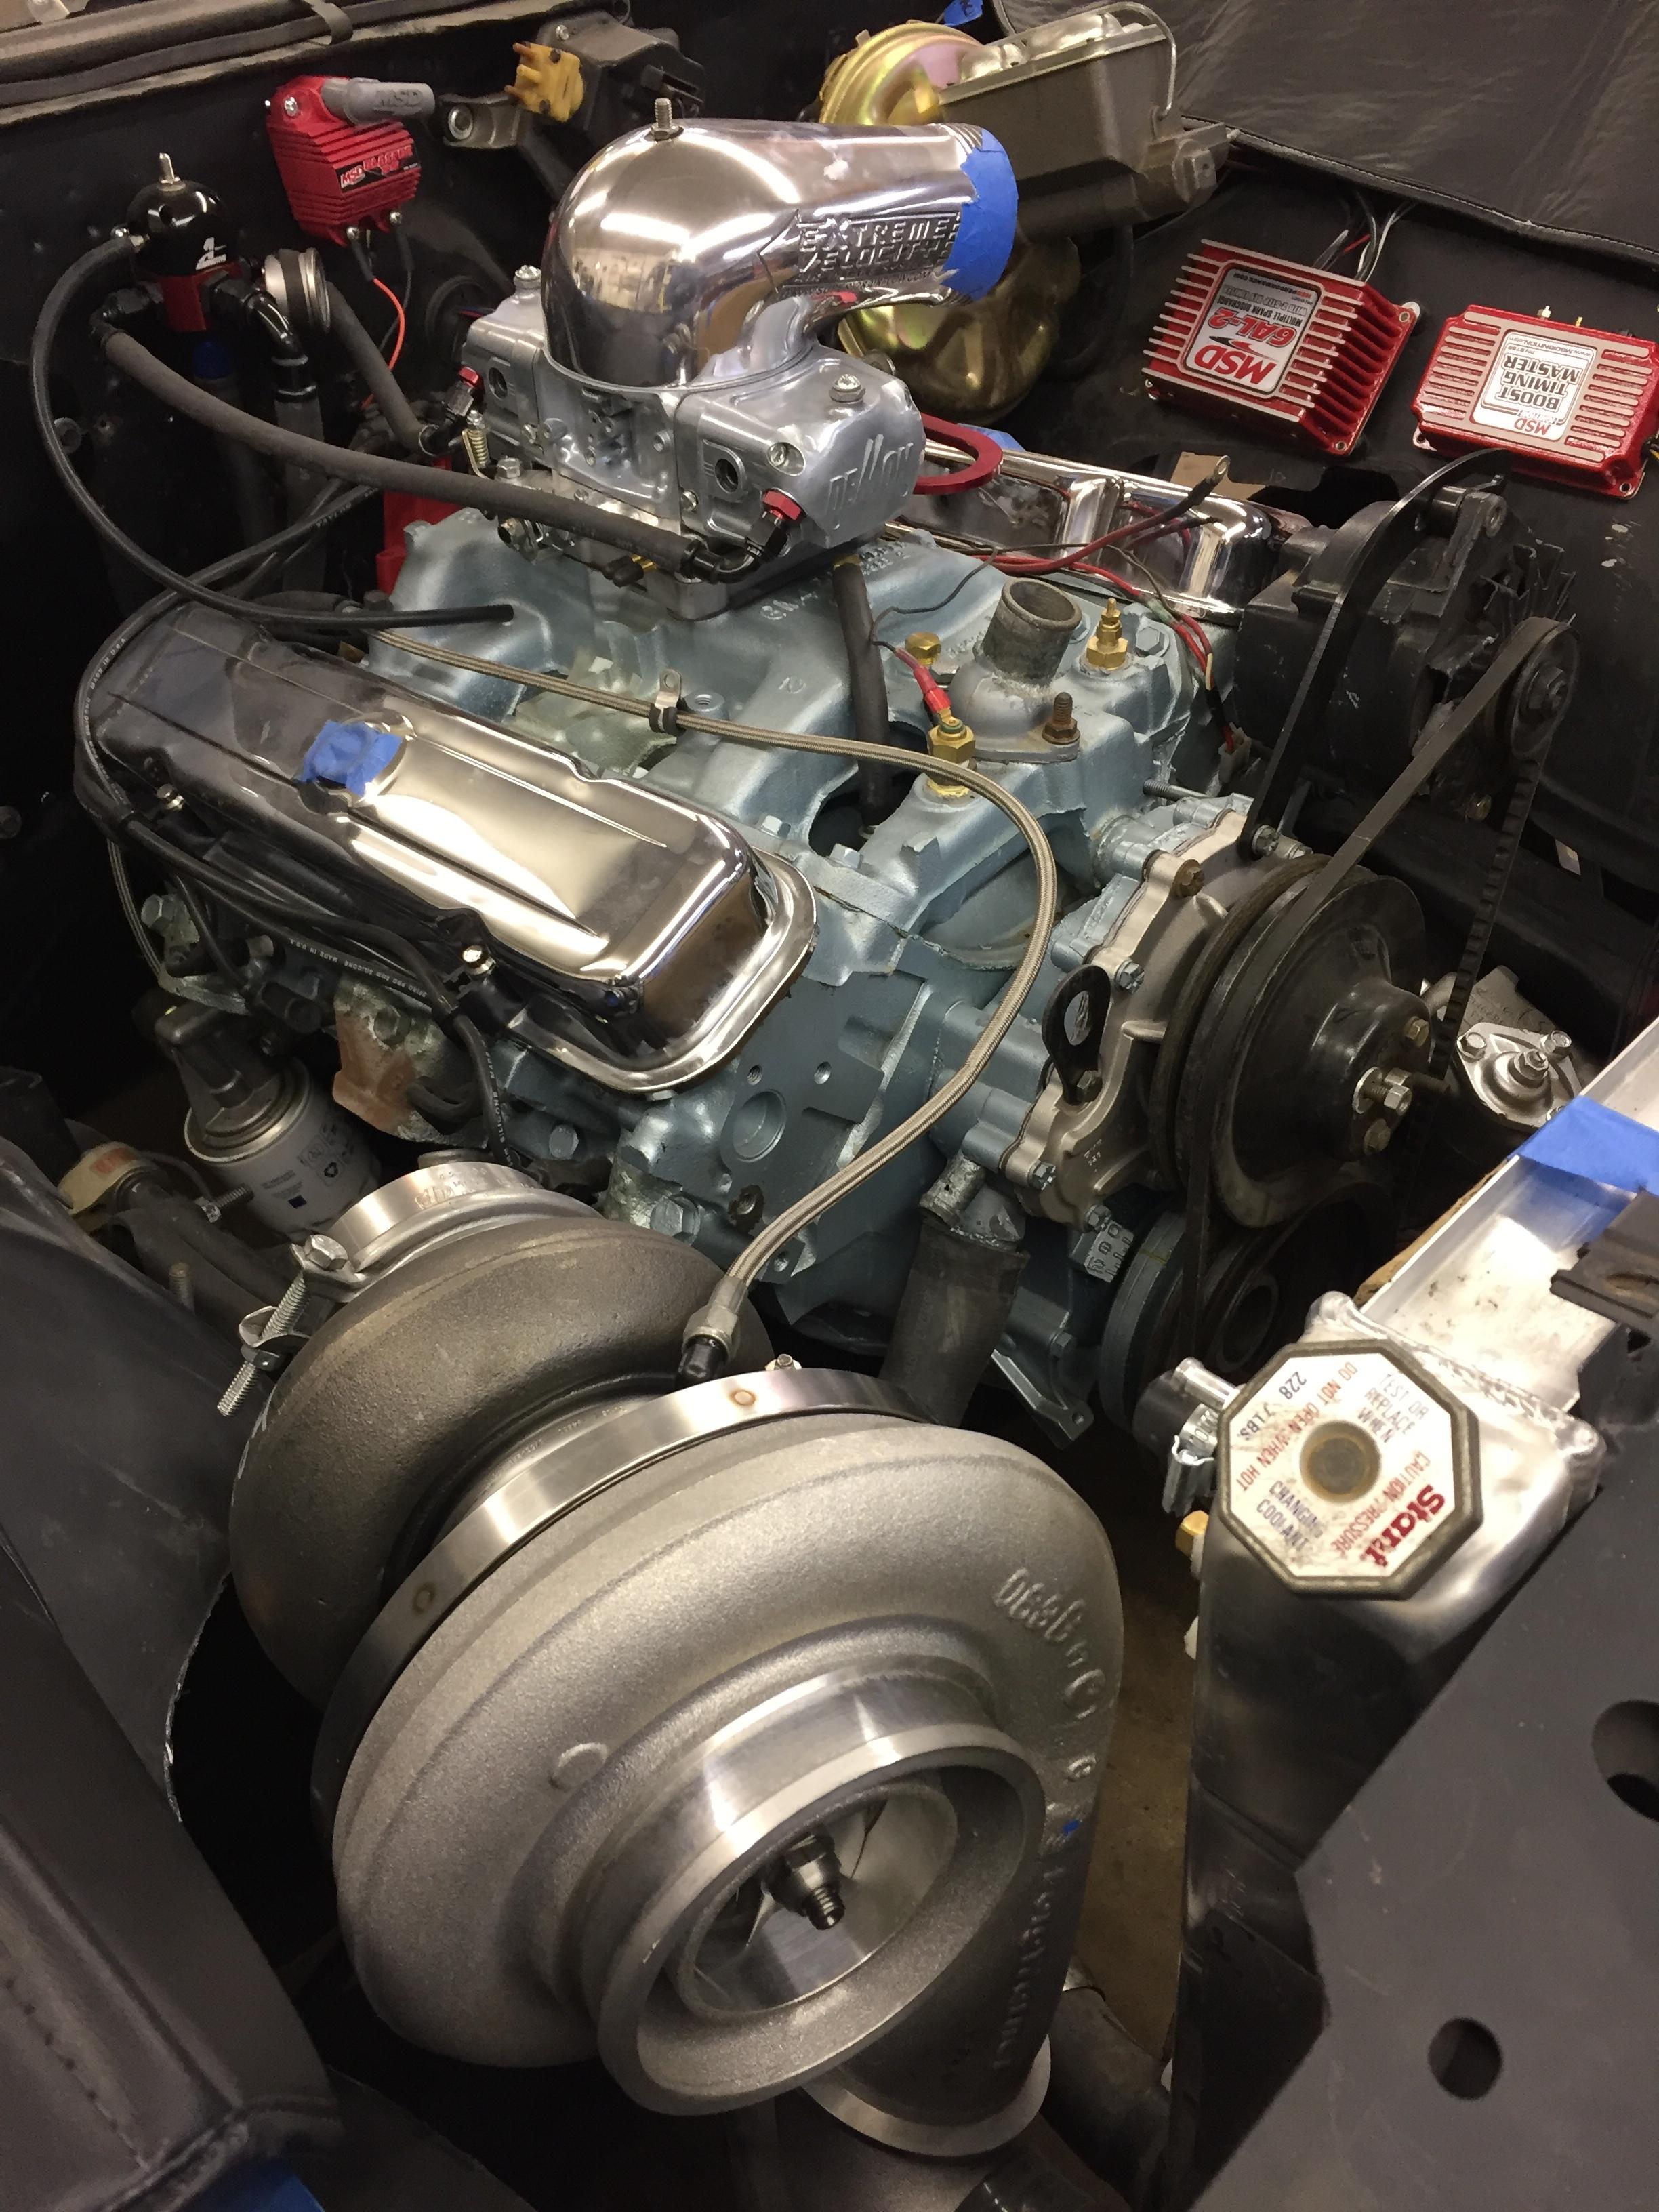 1972 Pontiac Station Wagon.  Turbo, Fuel Injection and Tremec TKO-600.  This kind of fun.